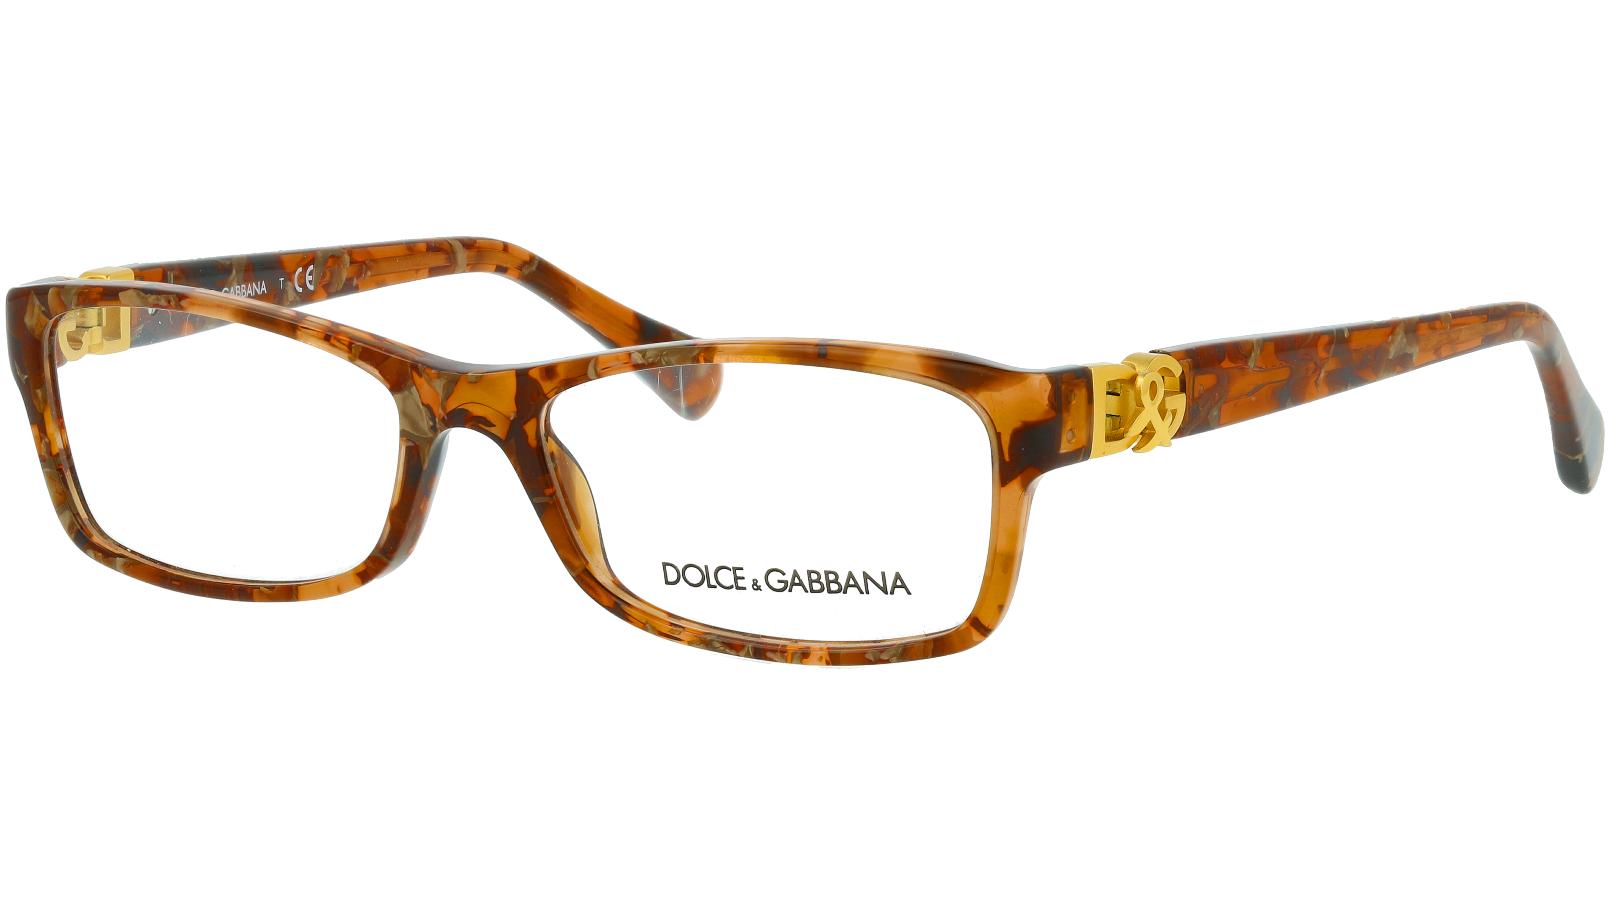 Dolce&Gabbana DG3147P 2550 53 HAVANA Glasses